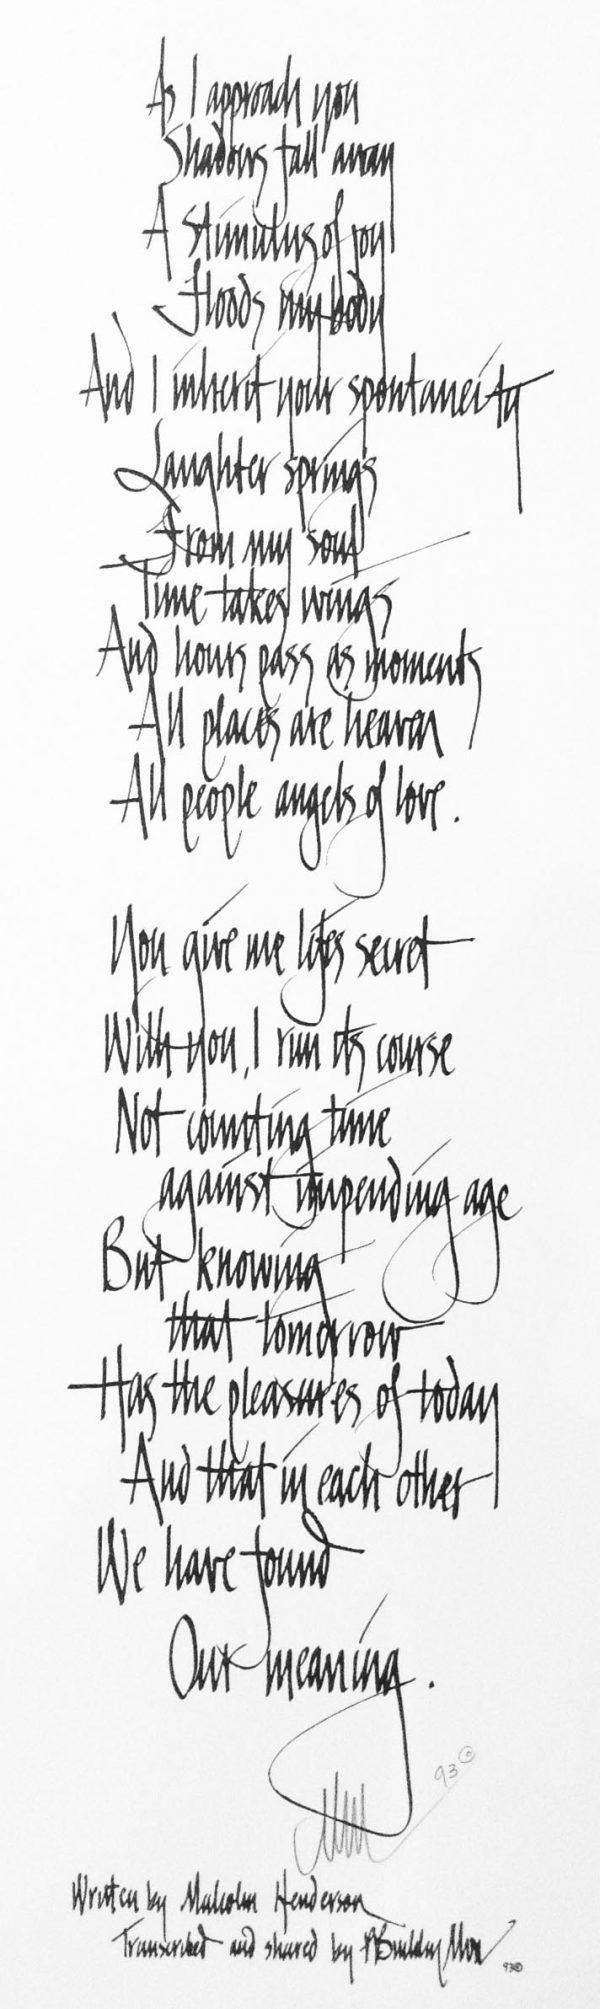 Pat Buckley Moss - From My Soul